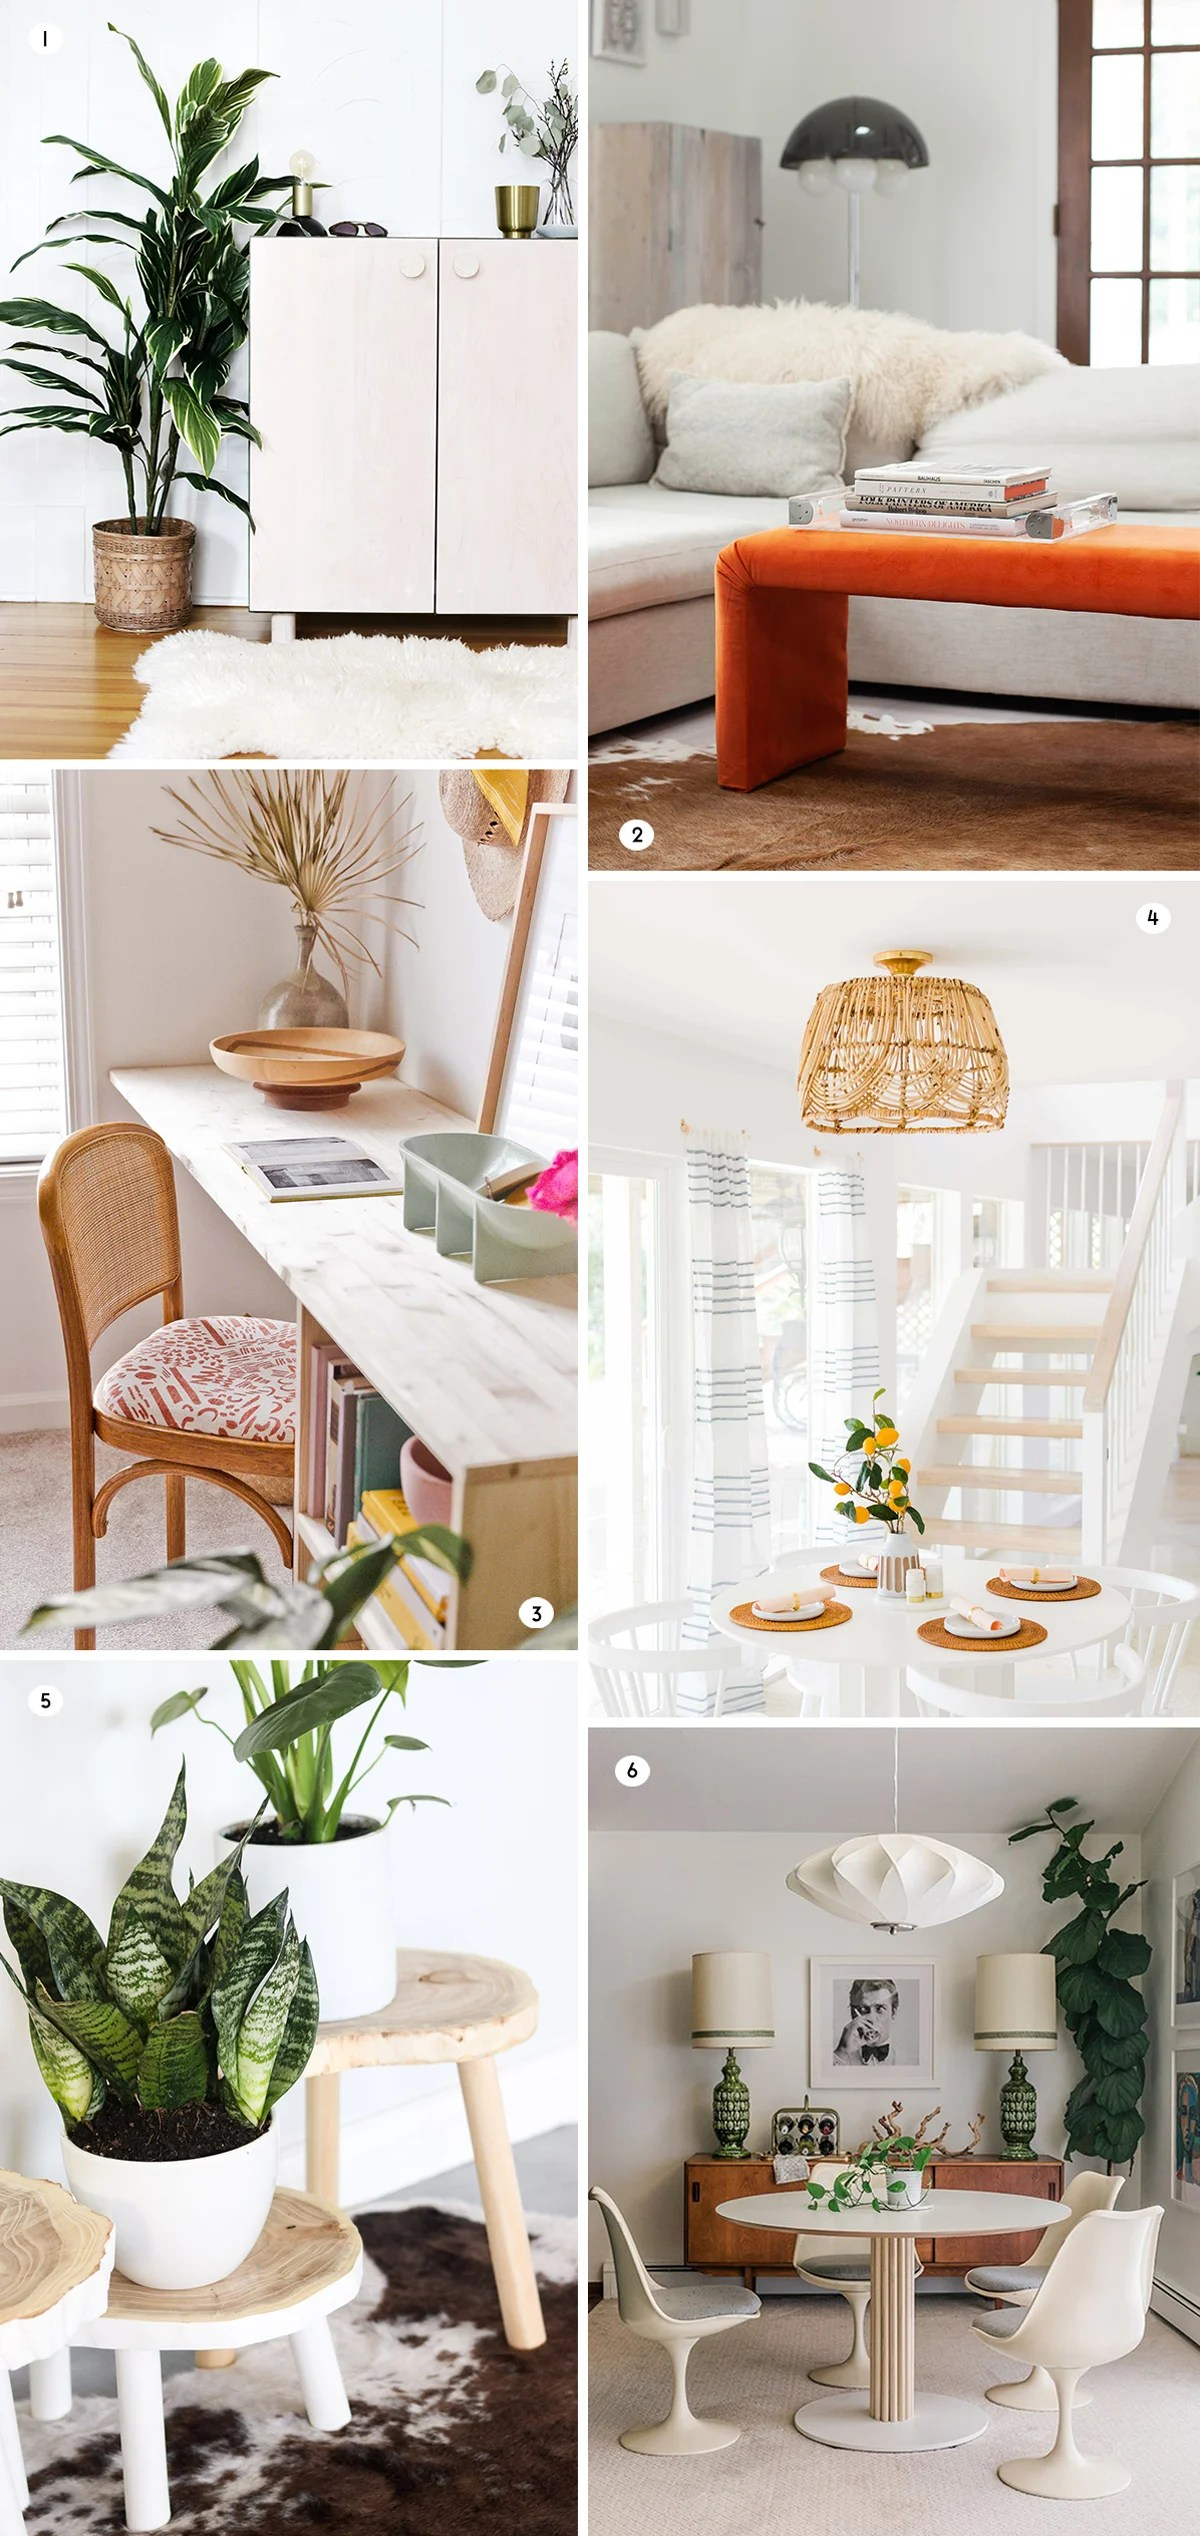 6 cool diy furniture